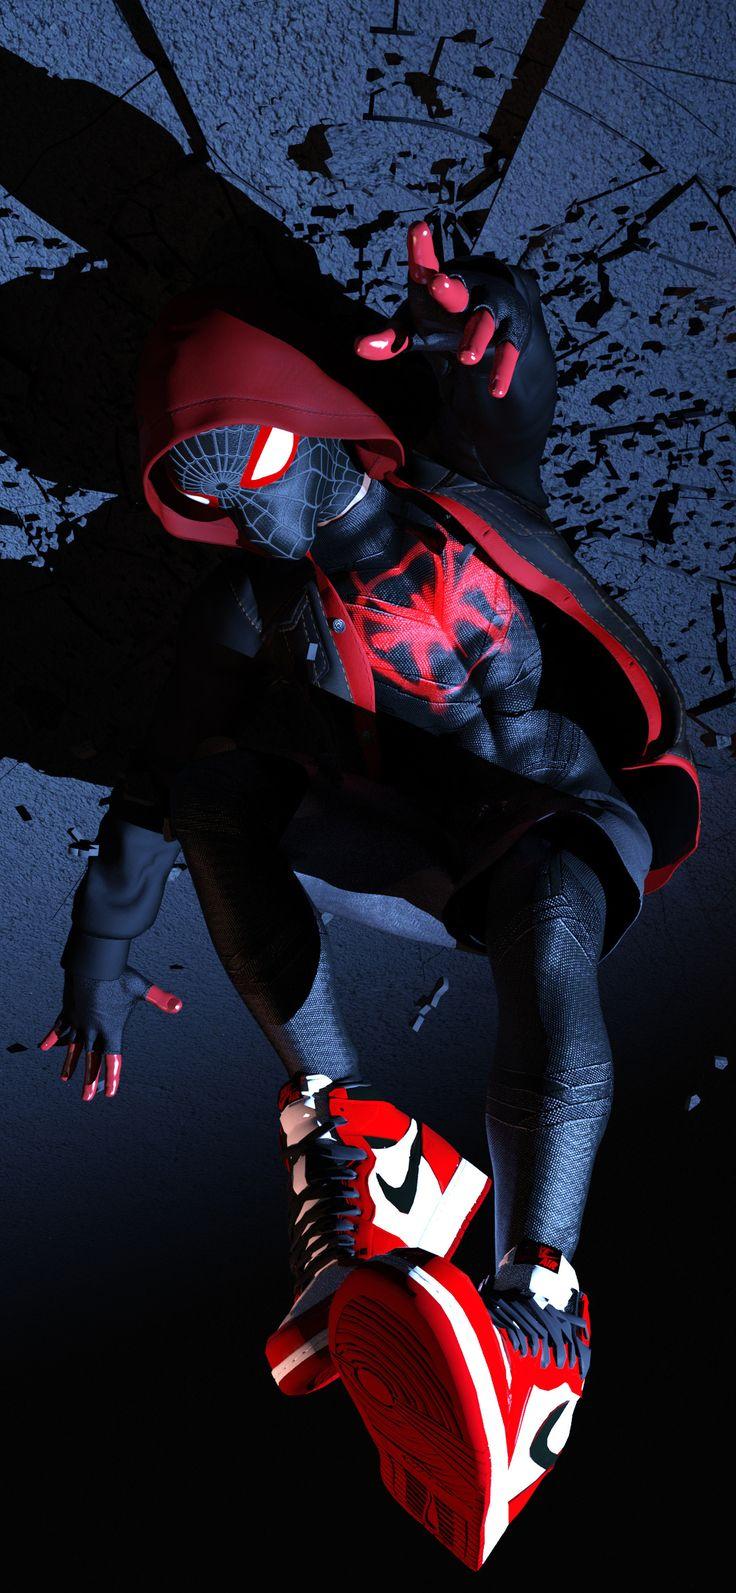 1125x2436 Spiderman Miles Morales 4k Iphone XS,Iphone 10